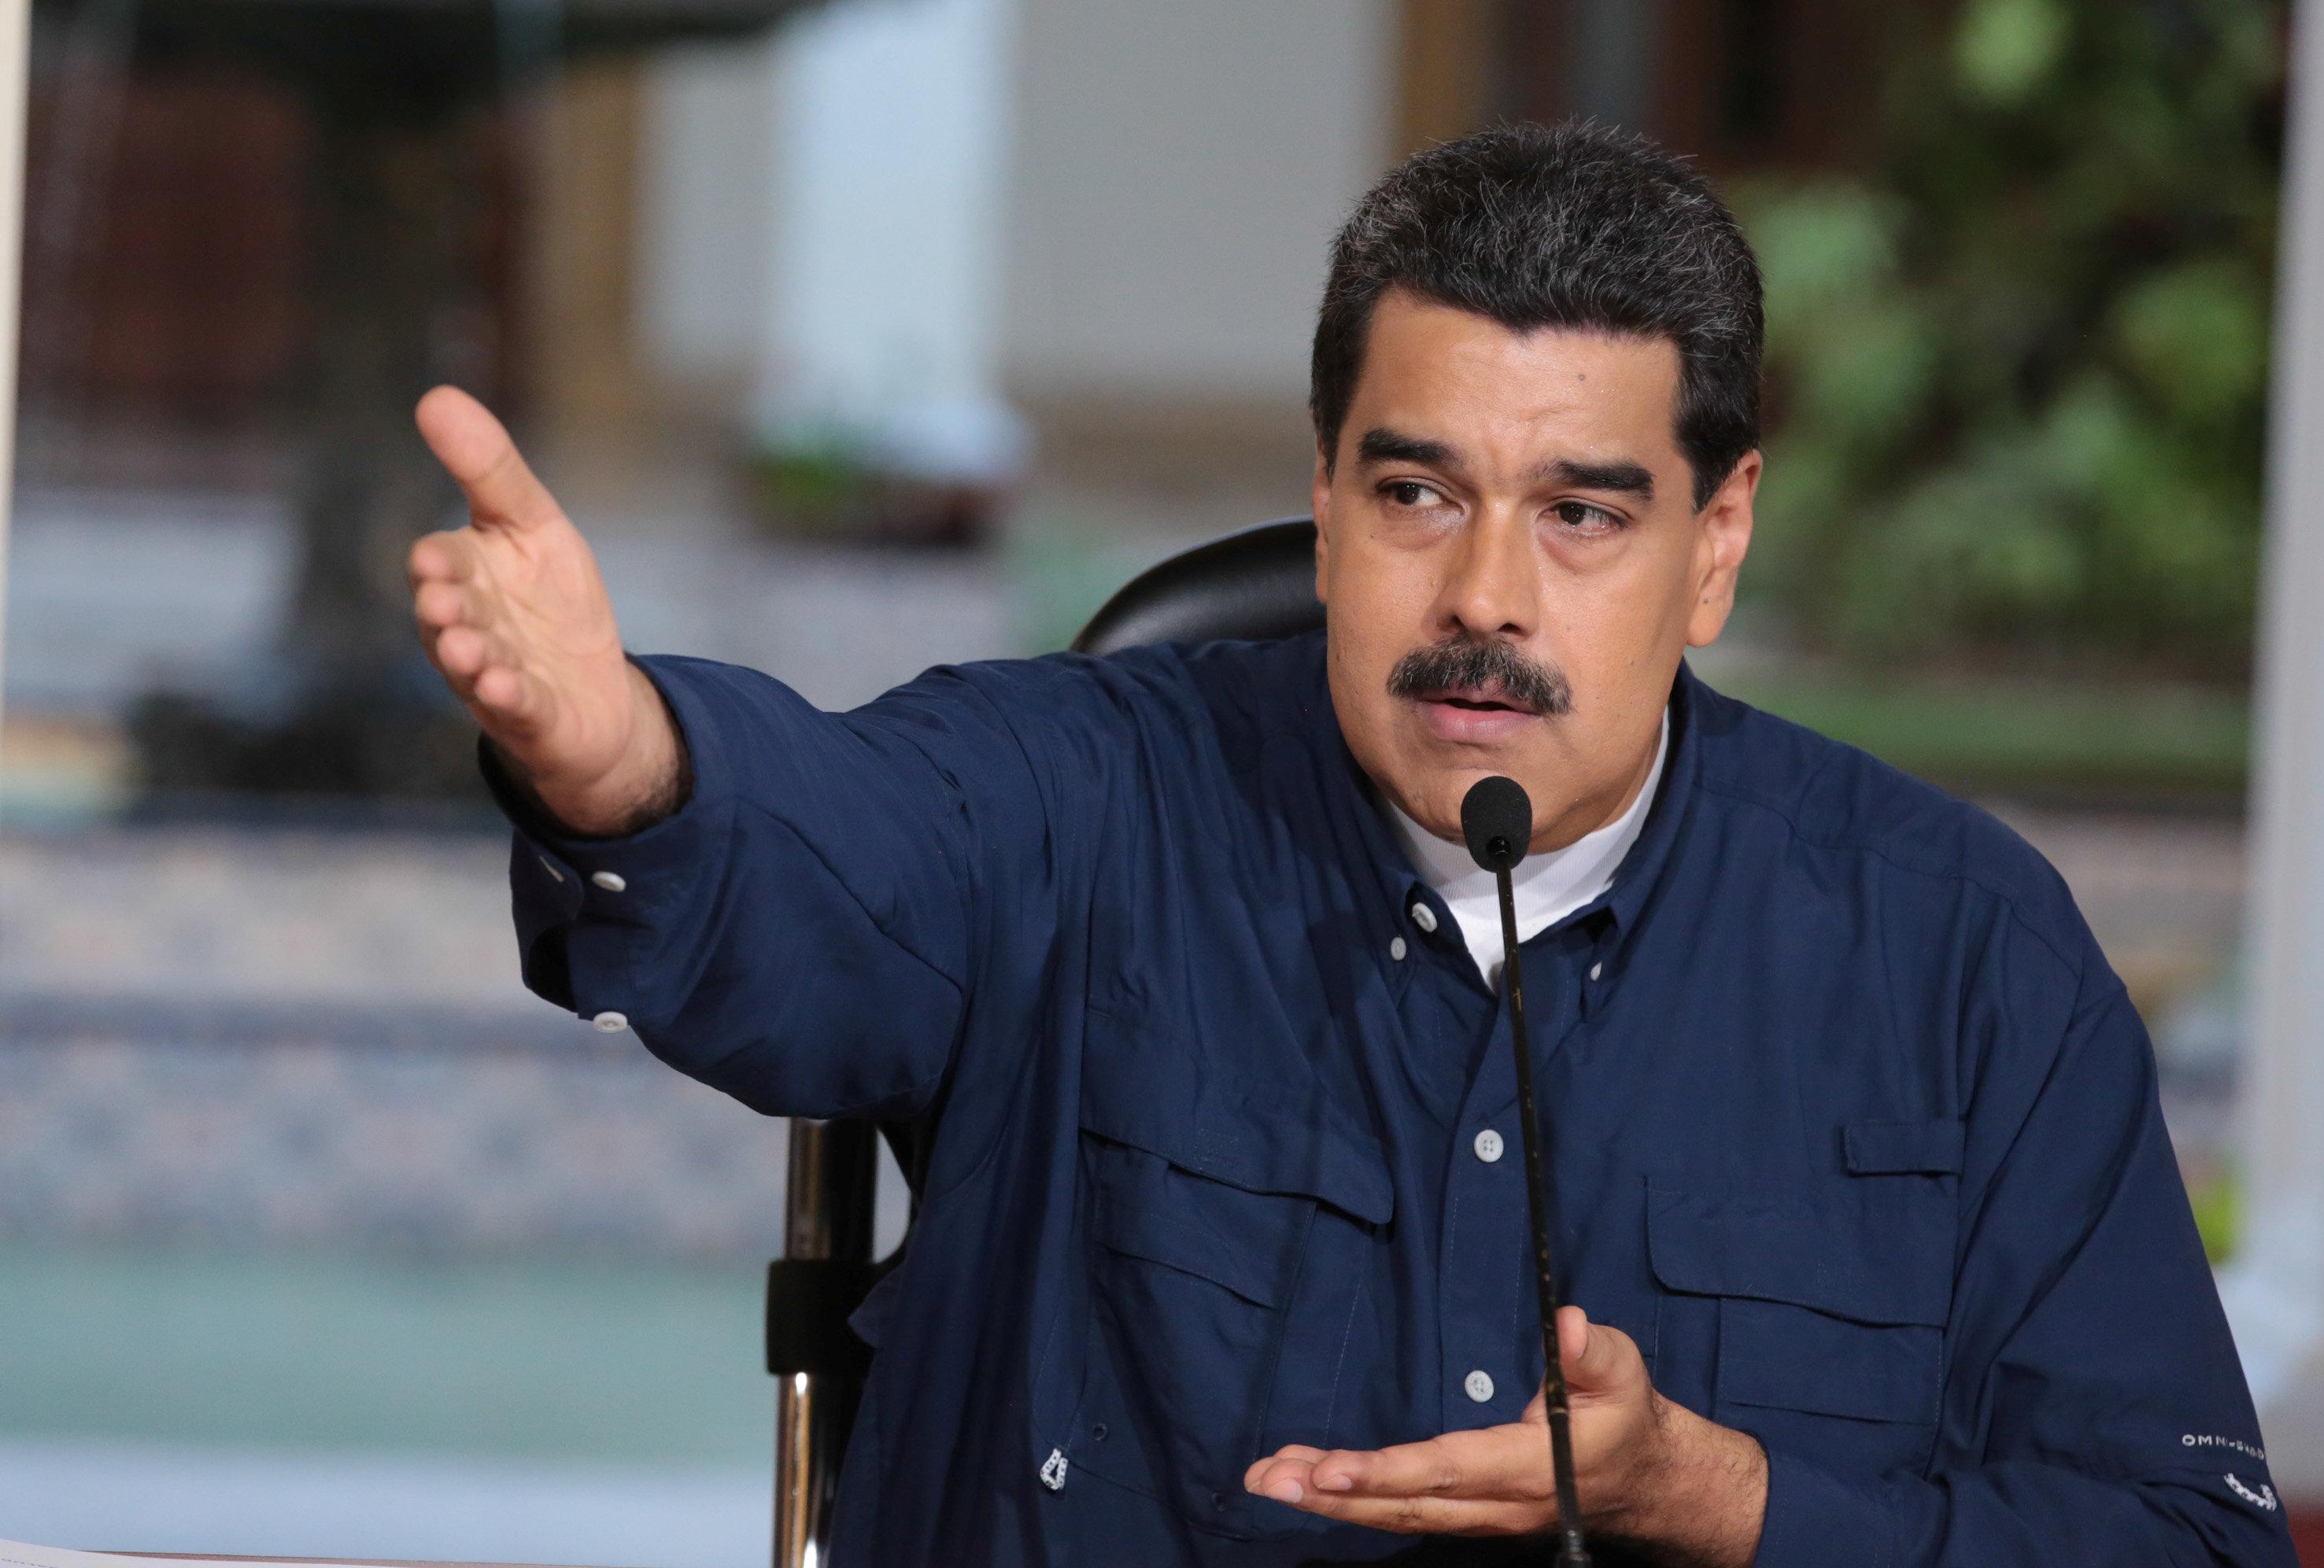 FILE PHOTO: Venezuela's President Nicolas Maduro speaks during a meeting at Miraflores Palace in Caracas, Venezuela August 25, 2017. Miraflores Palace/Handout via REUTERS